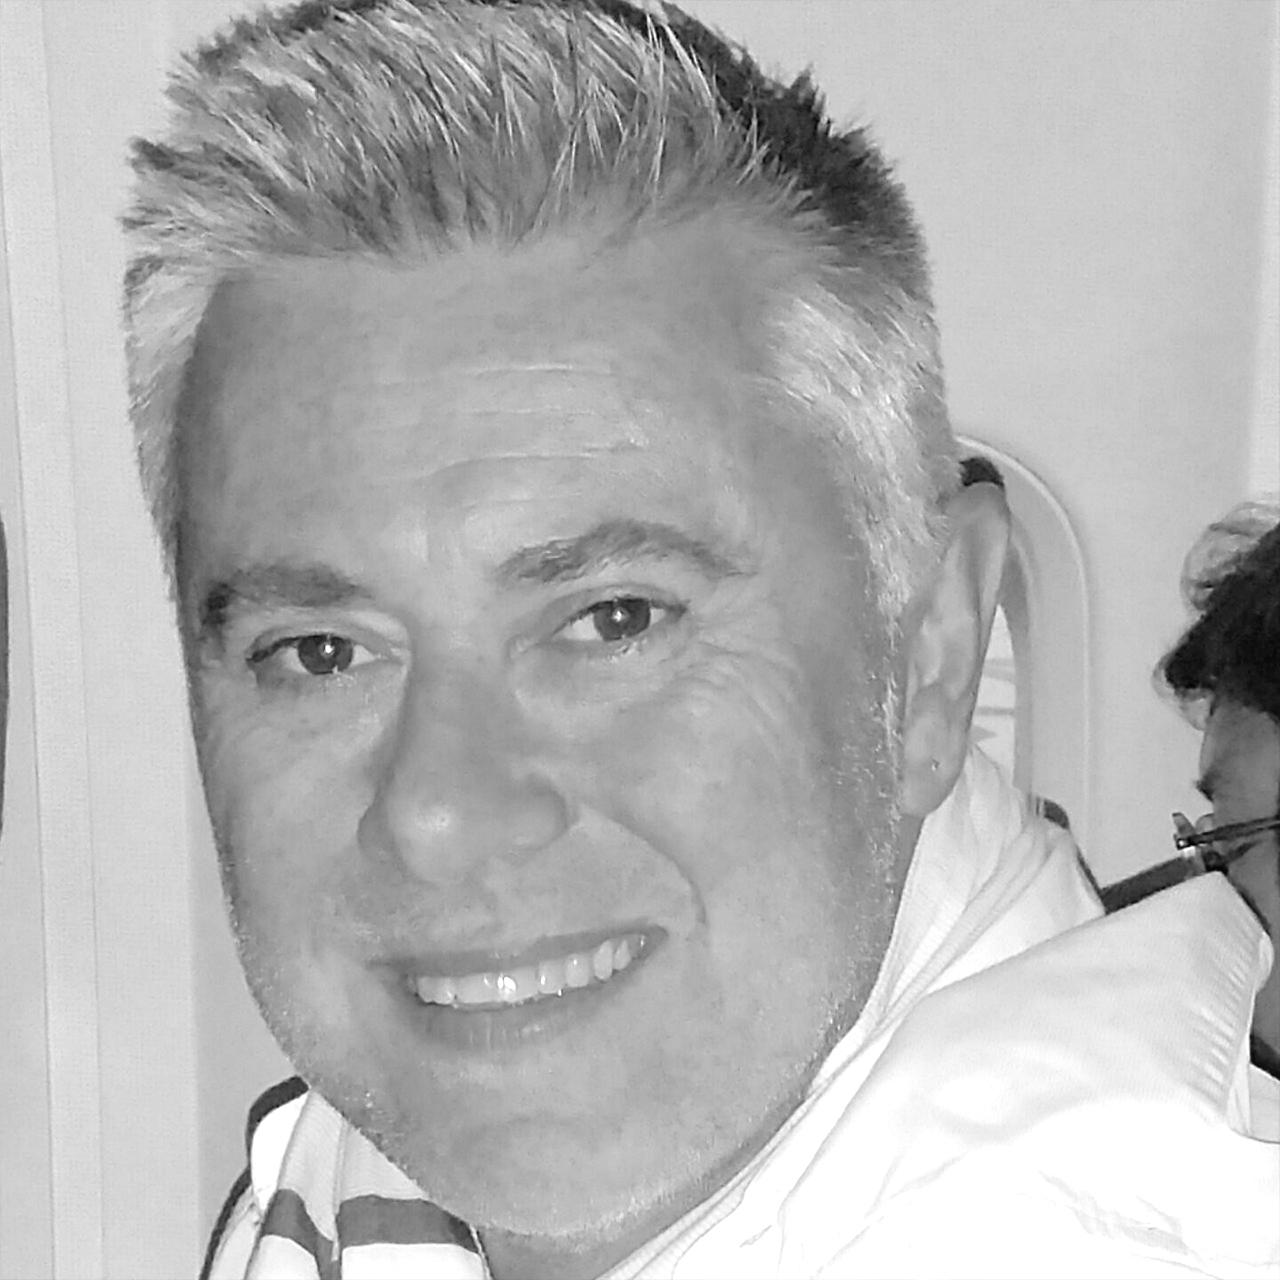 Jérôme Carlier